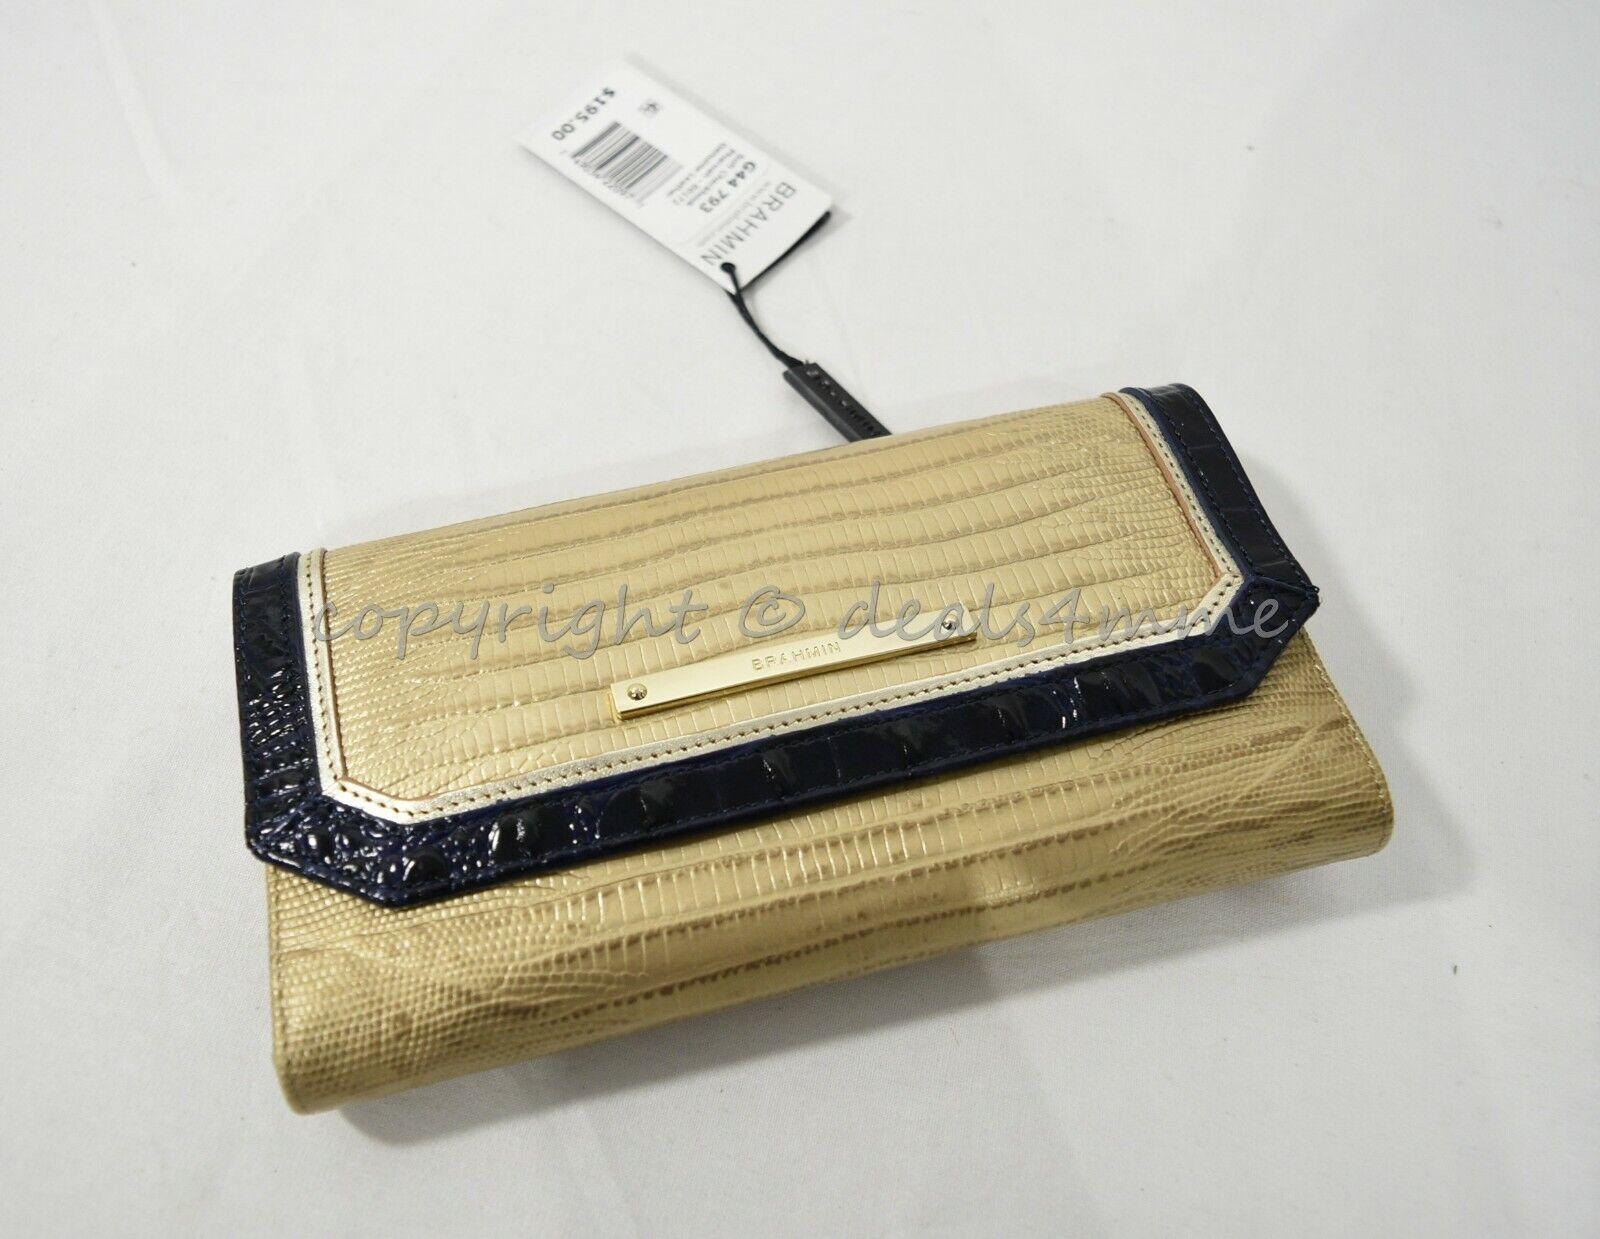 NWT Brahmin Soft Checkbook Leather Wallet in Pharoah Lizard Tri-Texture